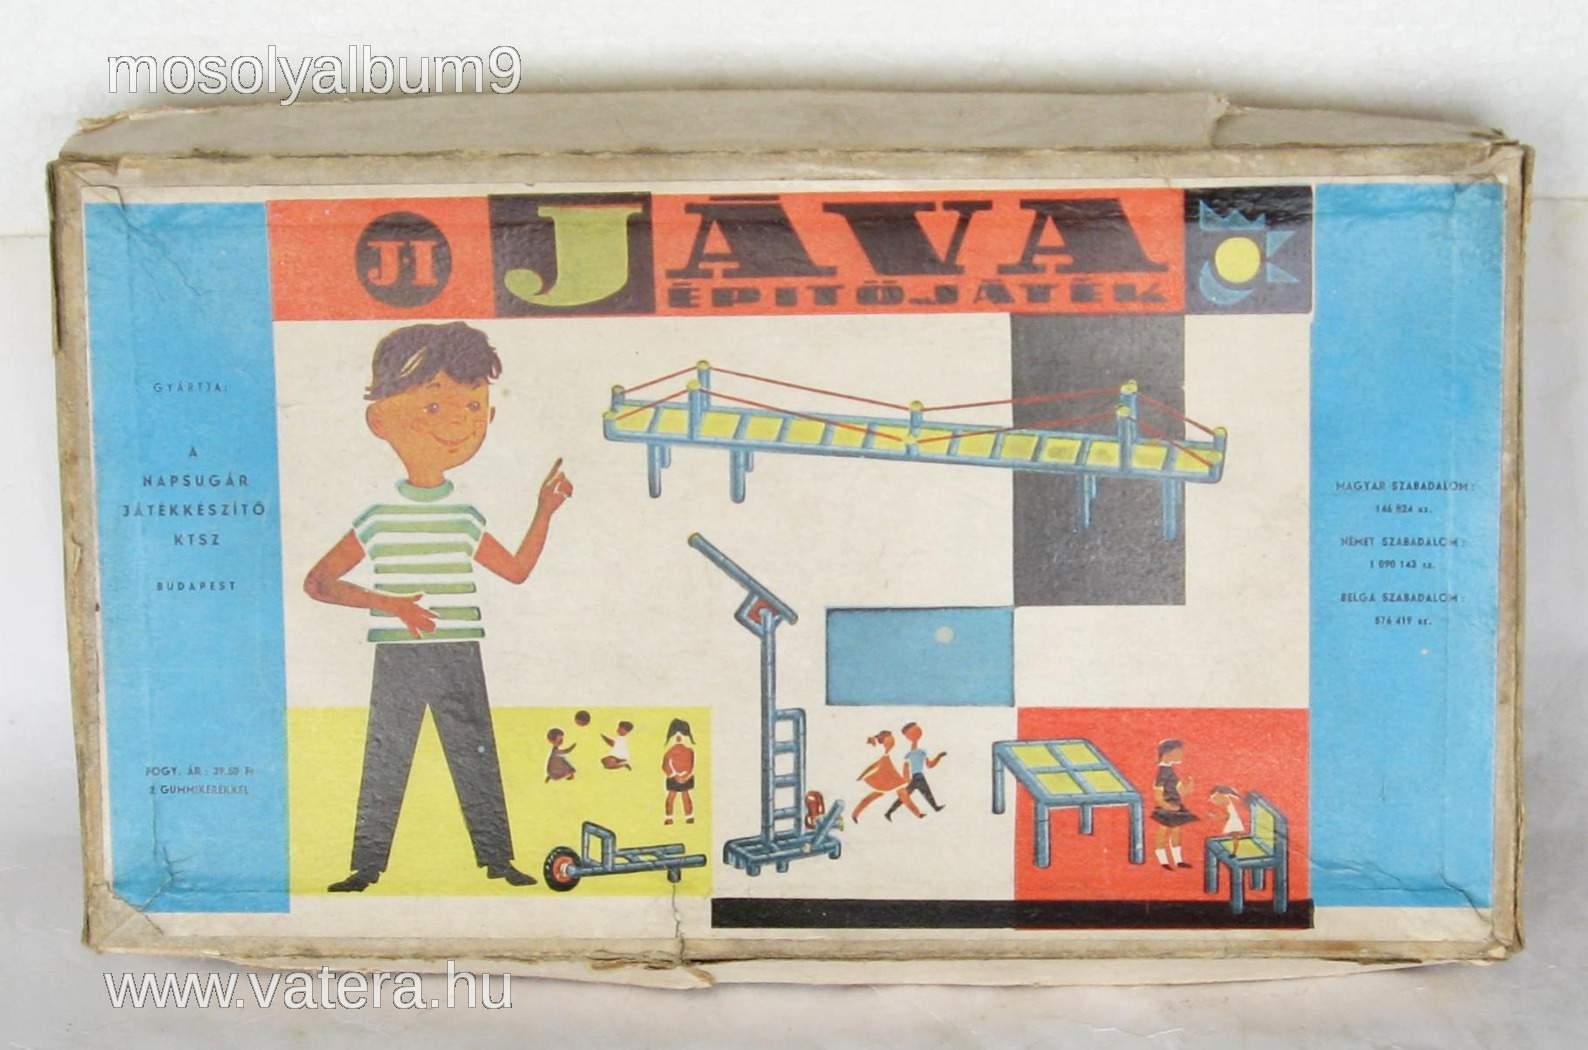 java-epito-magyar-retro-jatek-regiseg-kulonos-belsovel-ed1a_2_big.jpg